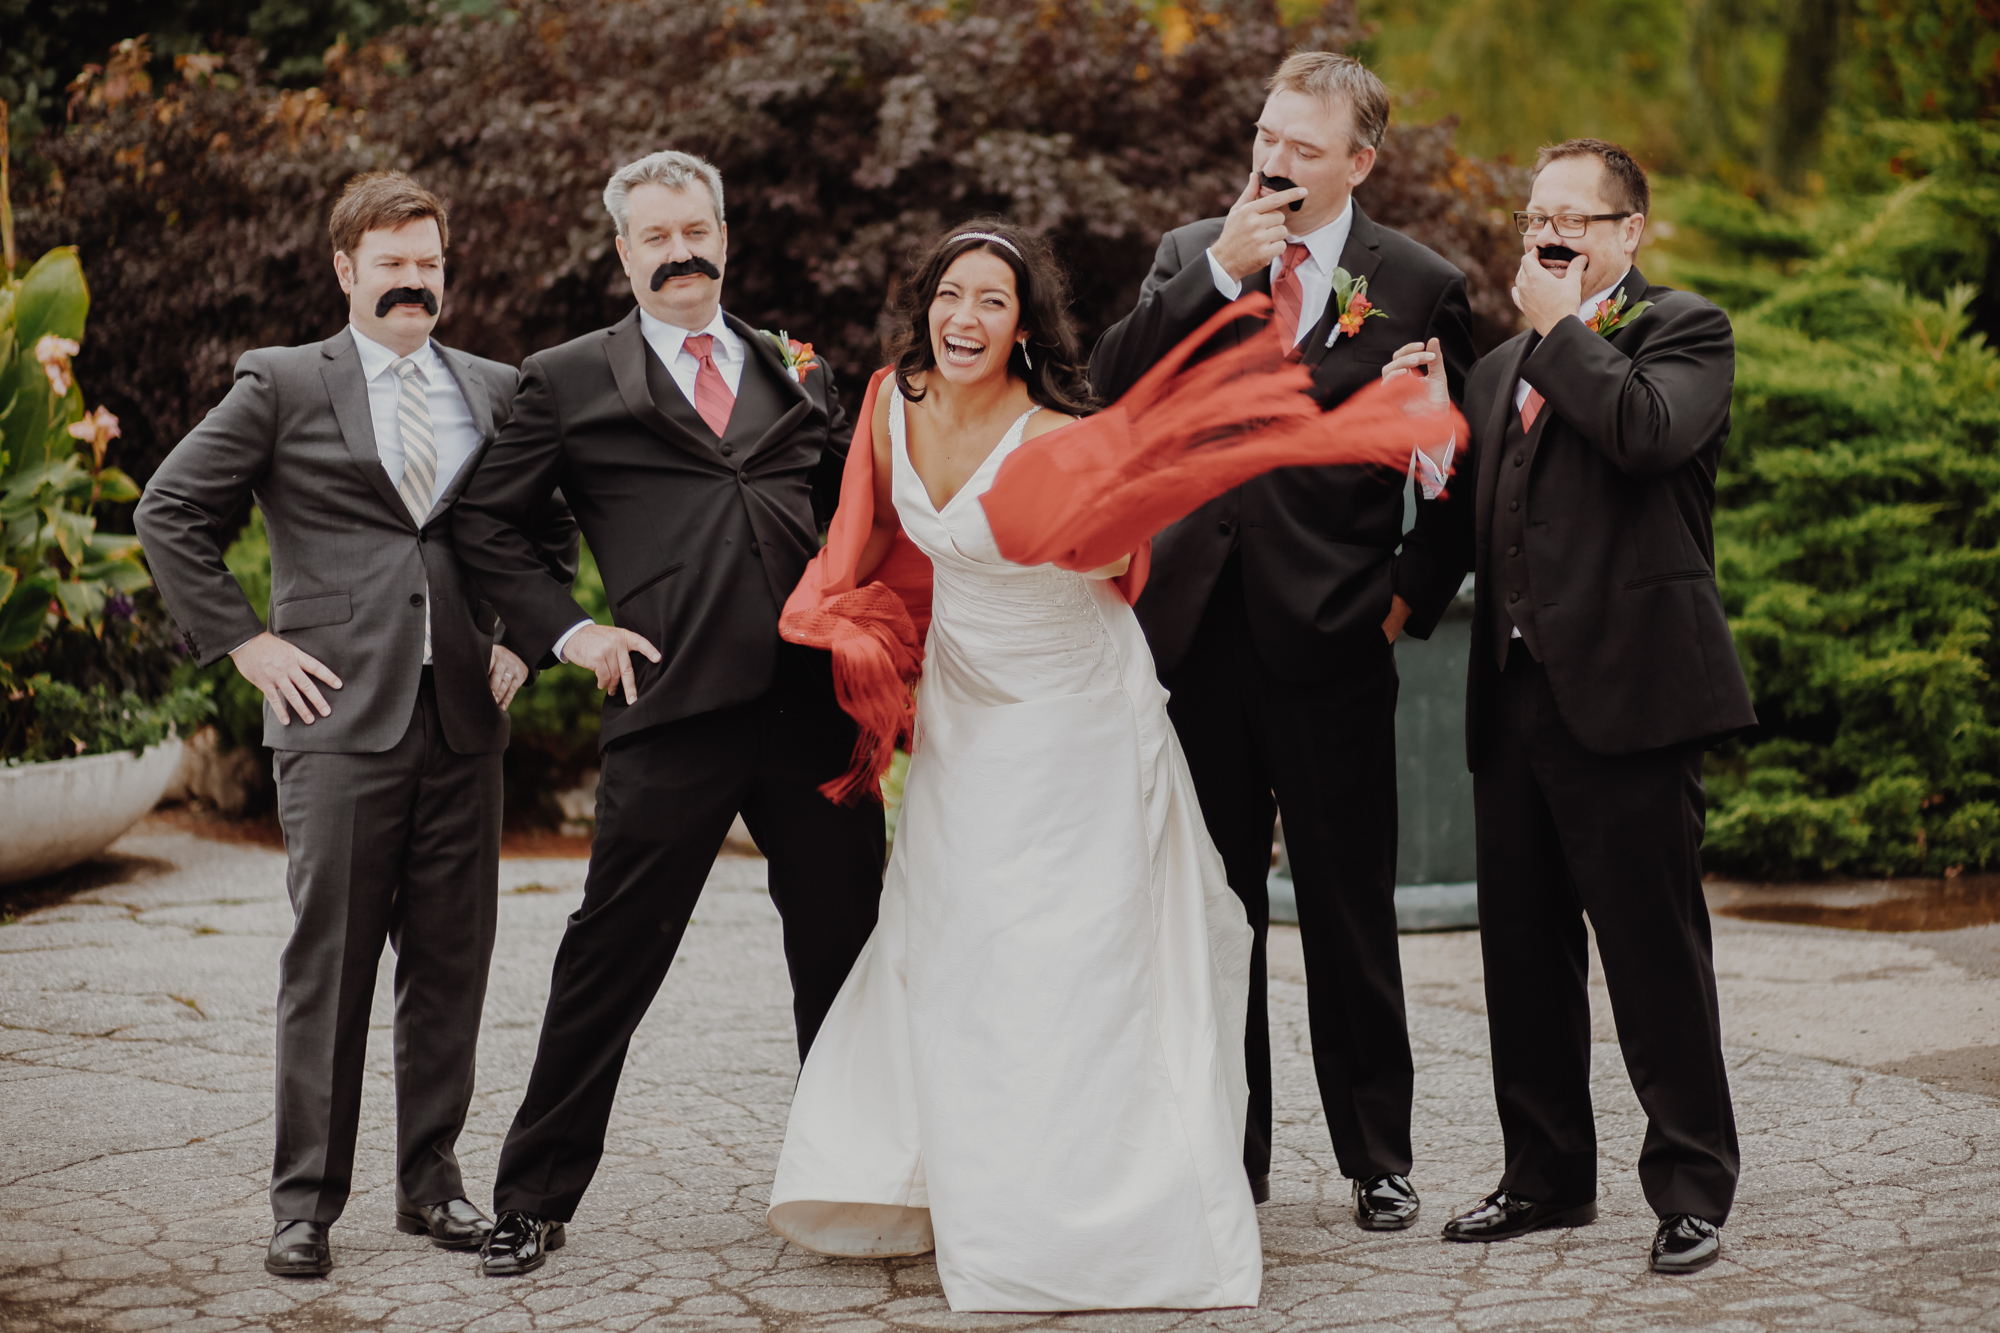 Creatives Ideas For Diy Wedding Photography Megan Breukelman Blog